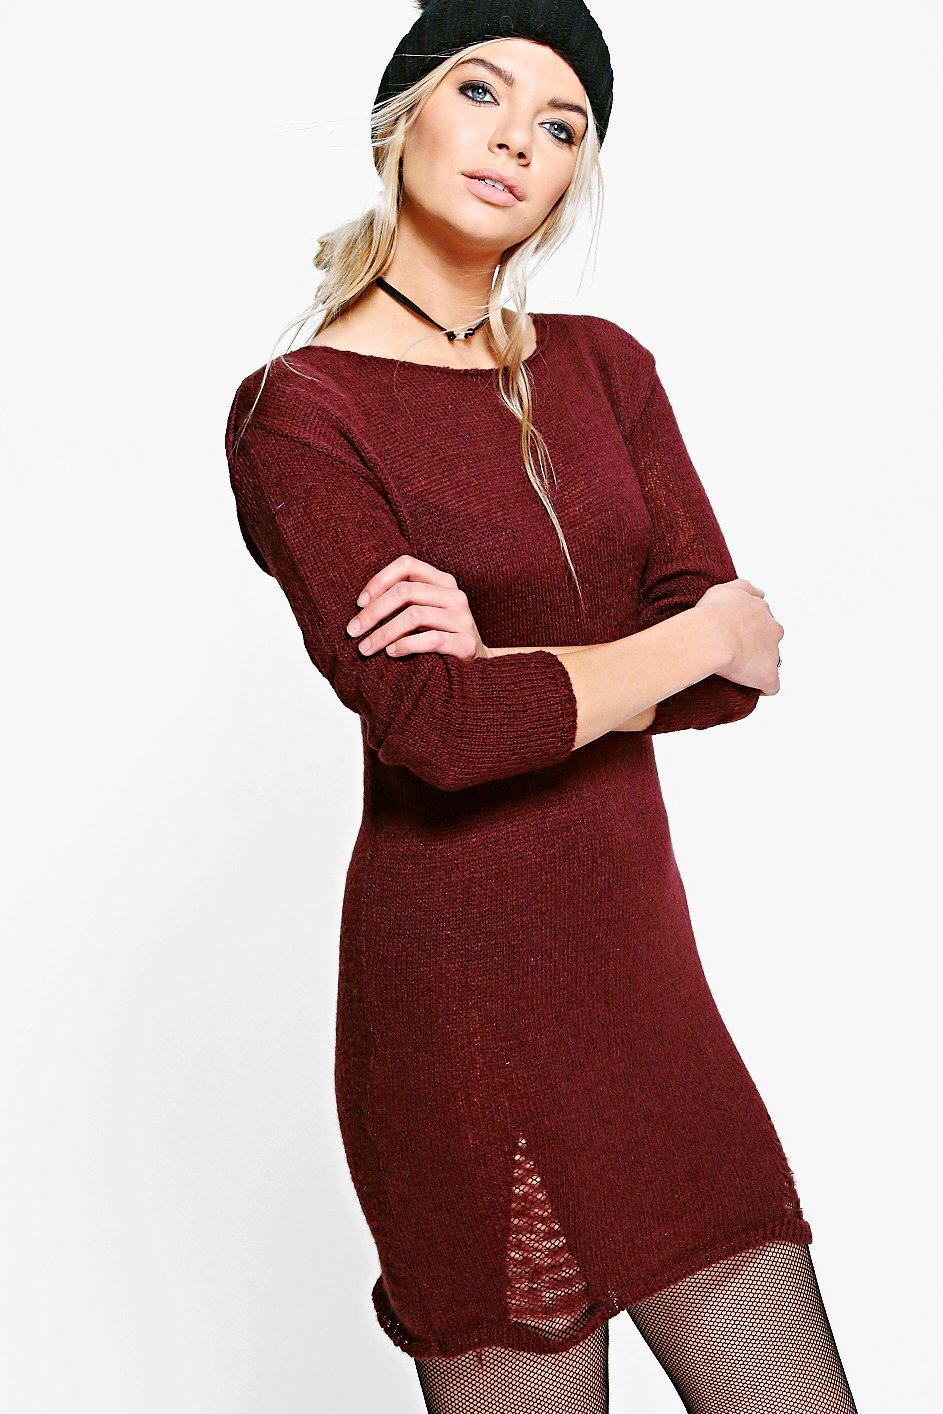 Distressed Detail Soft Knit Jumper Dress  burgundy